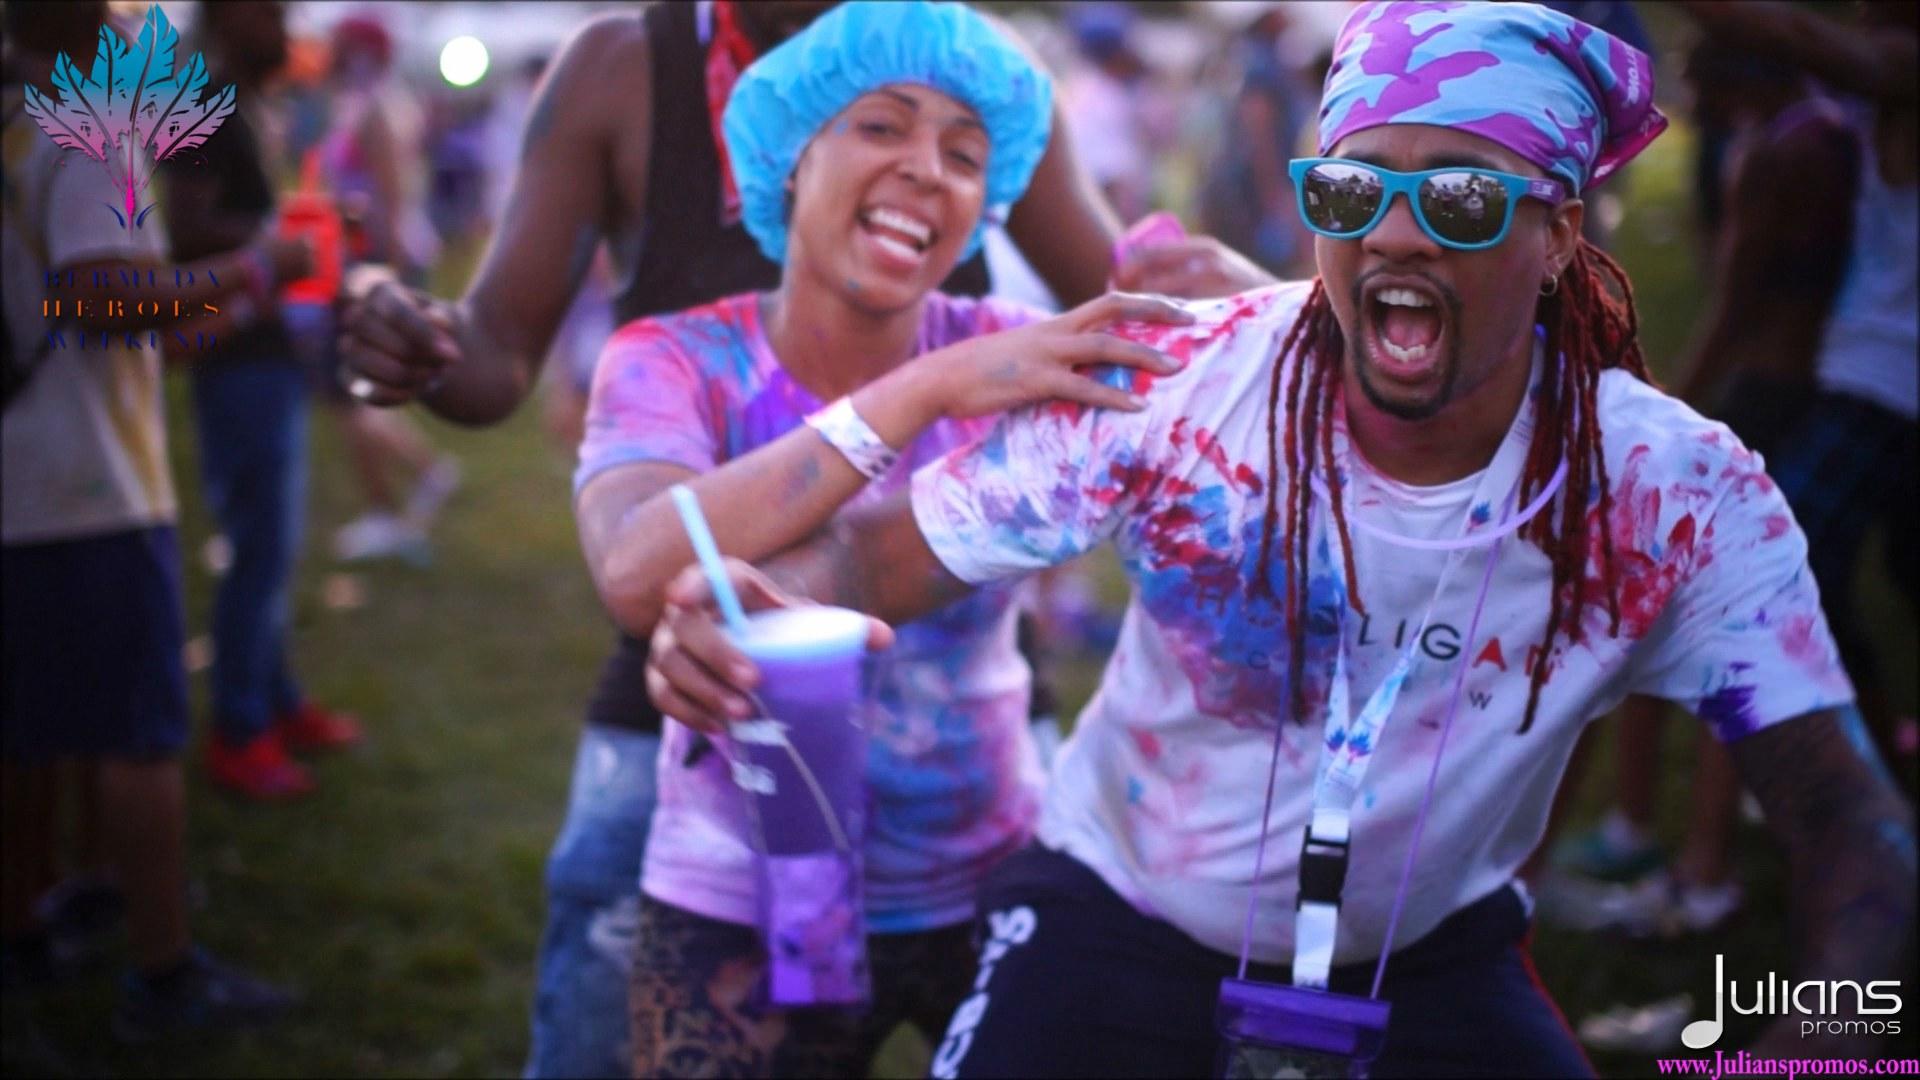 2015 Bermuda Carnival Highlights Julianspromos Web Site